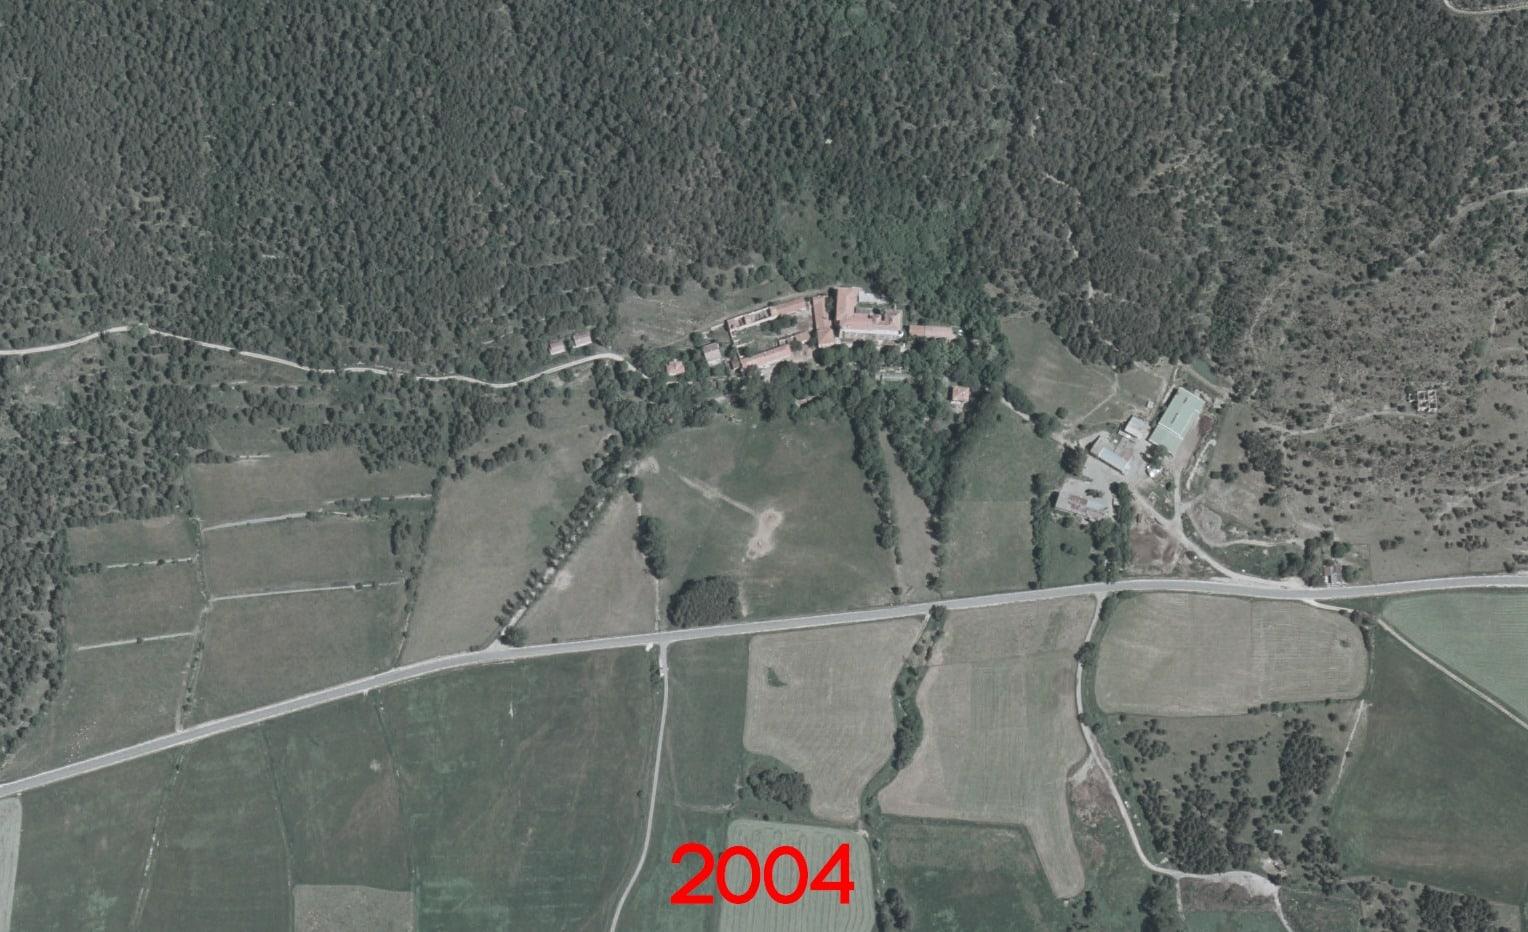 hopital-felix-zehetner-before-map-2004